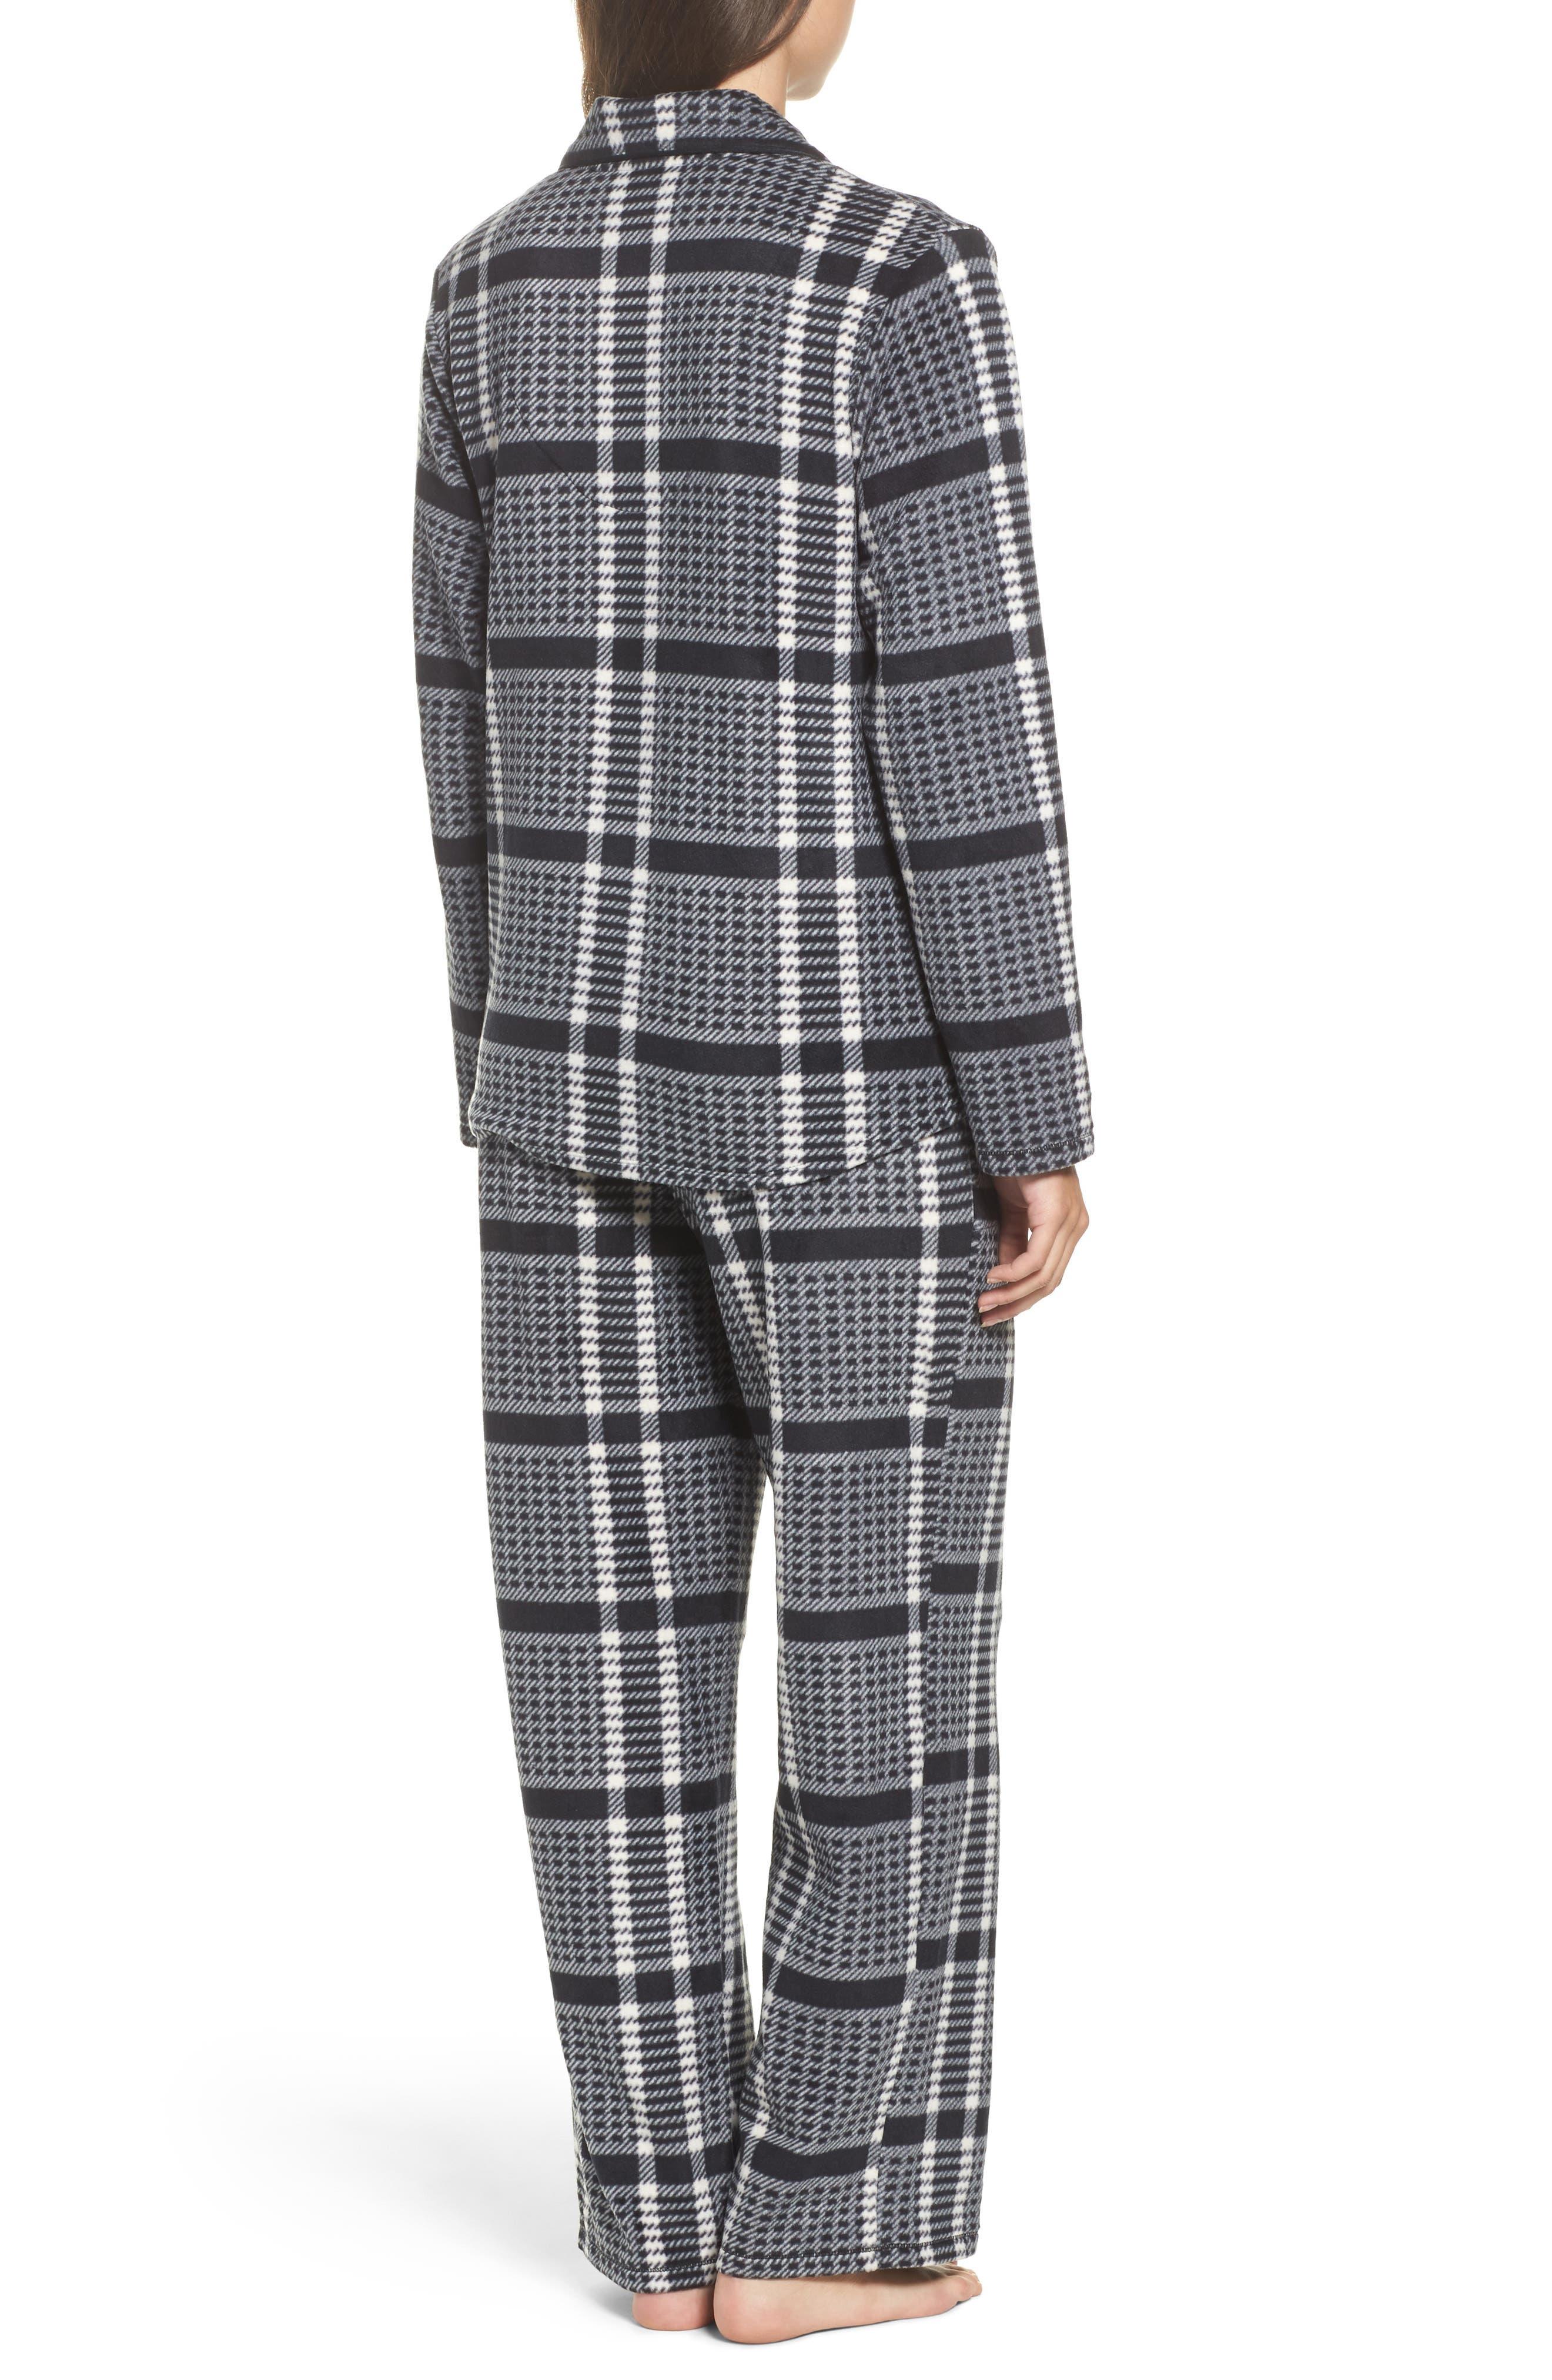 Stretch Fleece Long Pajamas,                             Alternate thumbnail 2, color,                             005